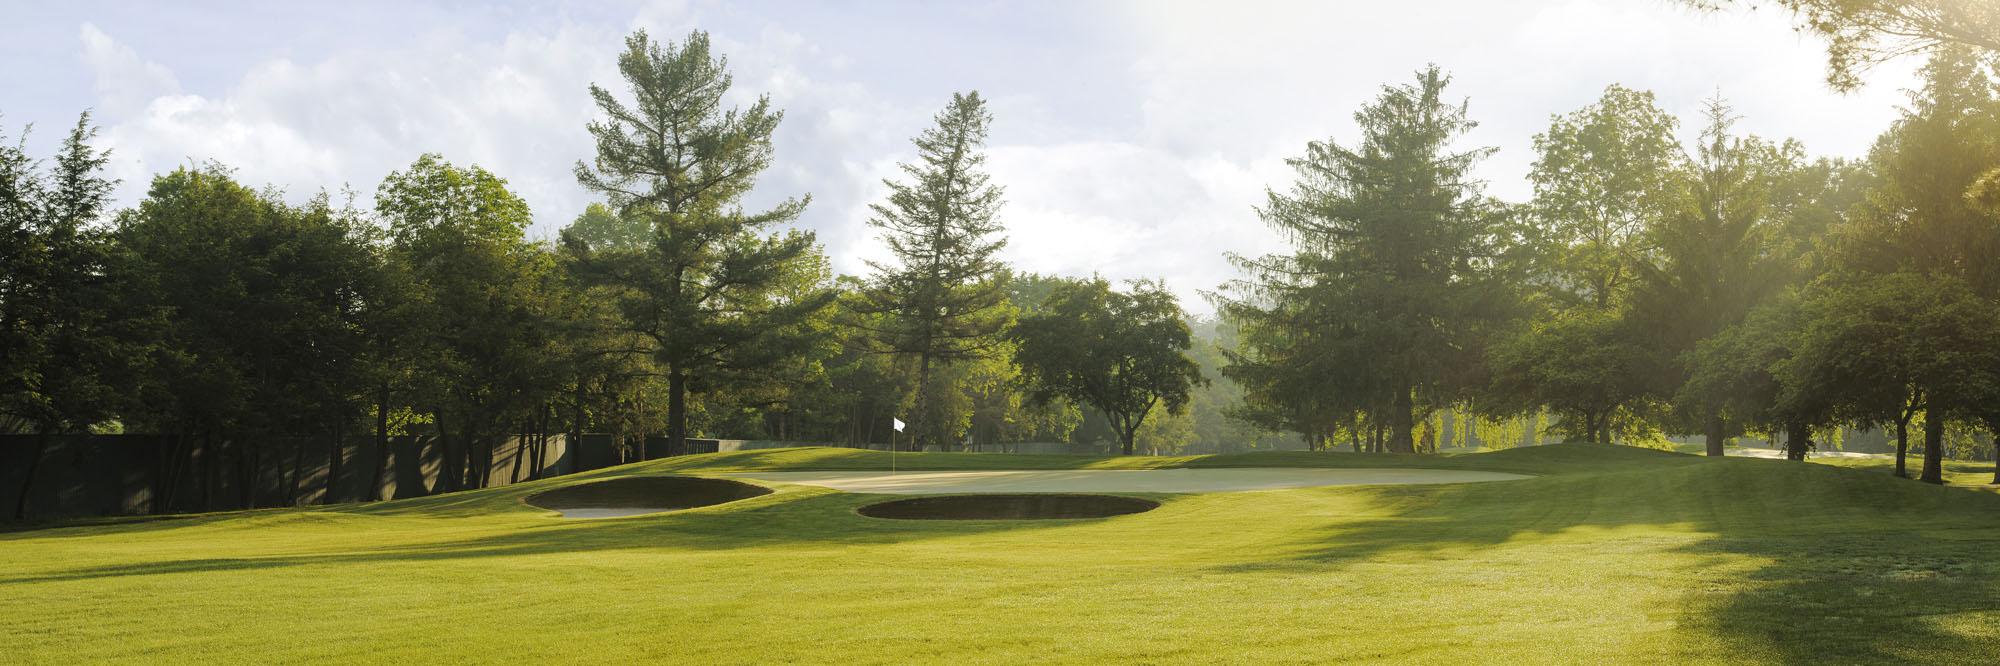 Golf Course Image - The Greenbrier Meadows Course No. 5